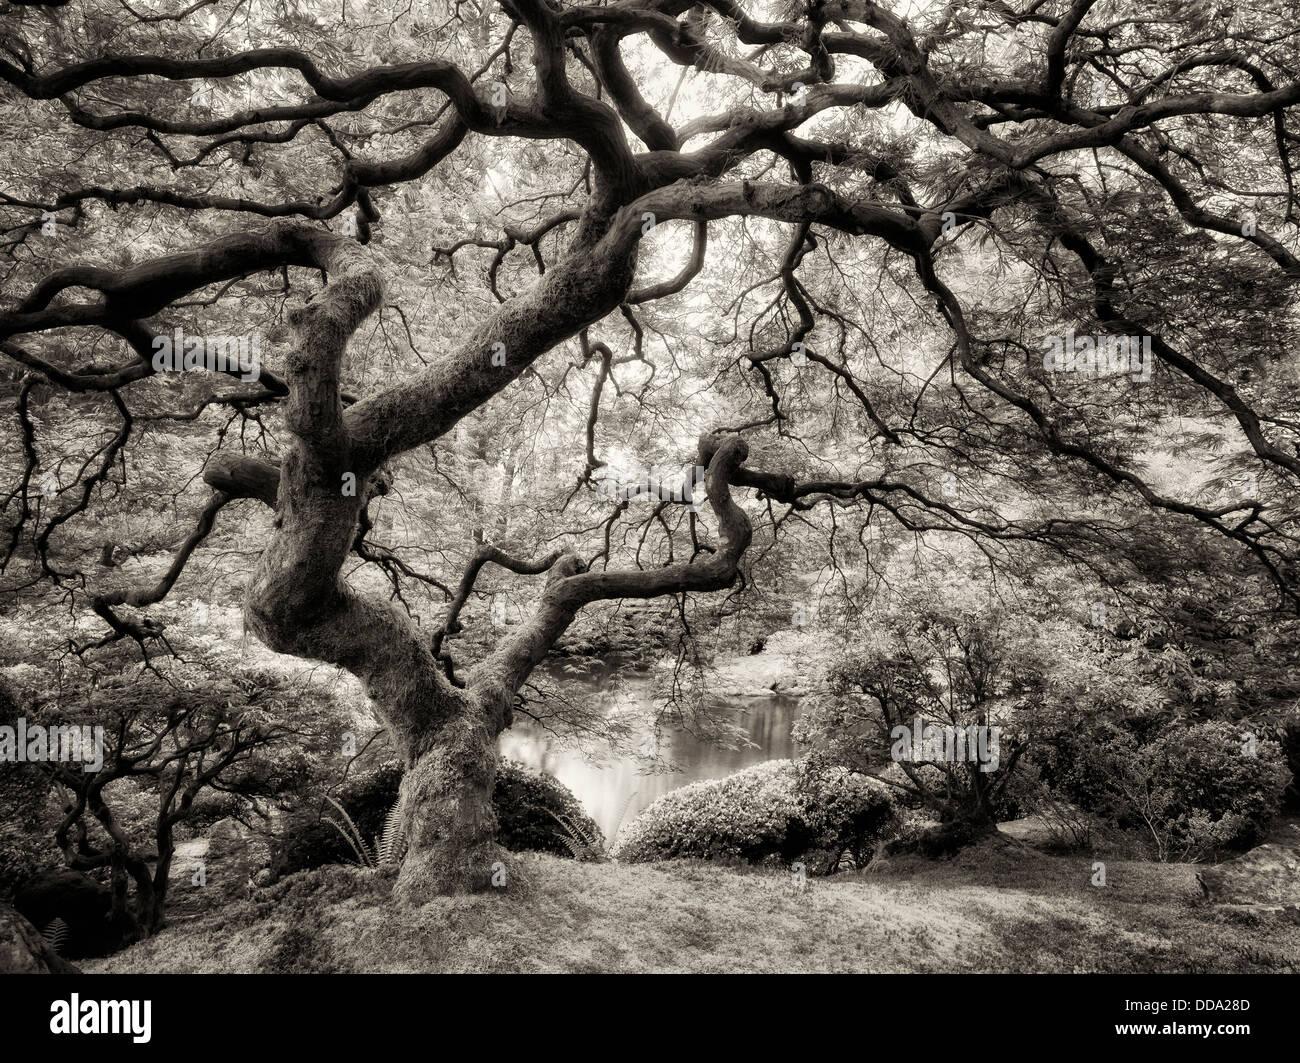 Japanese Maple tree with new growth. Portland Japanese Garden, Oregon - Stock Image